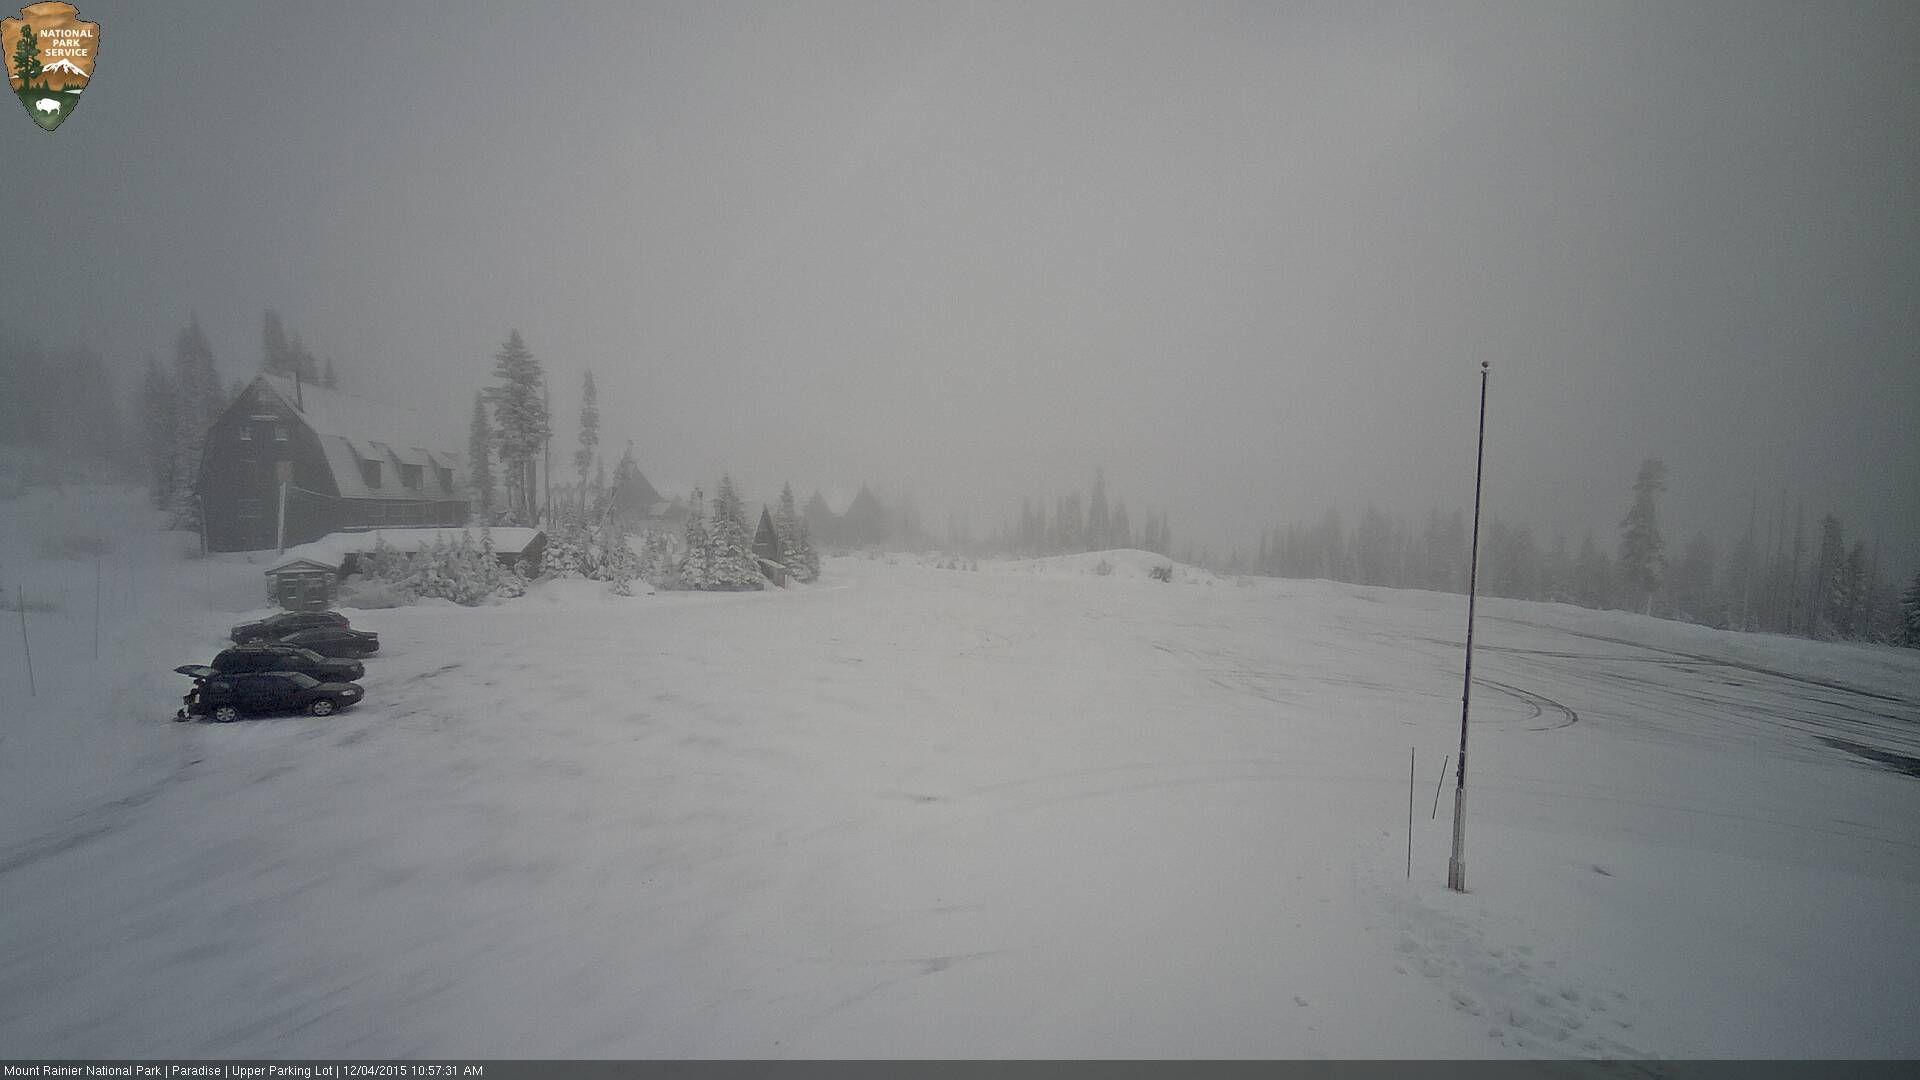 Mt Rainier NP Dec. 4, 2015 Looking east over the parking